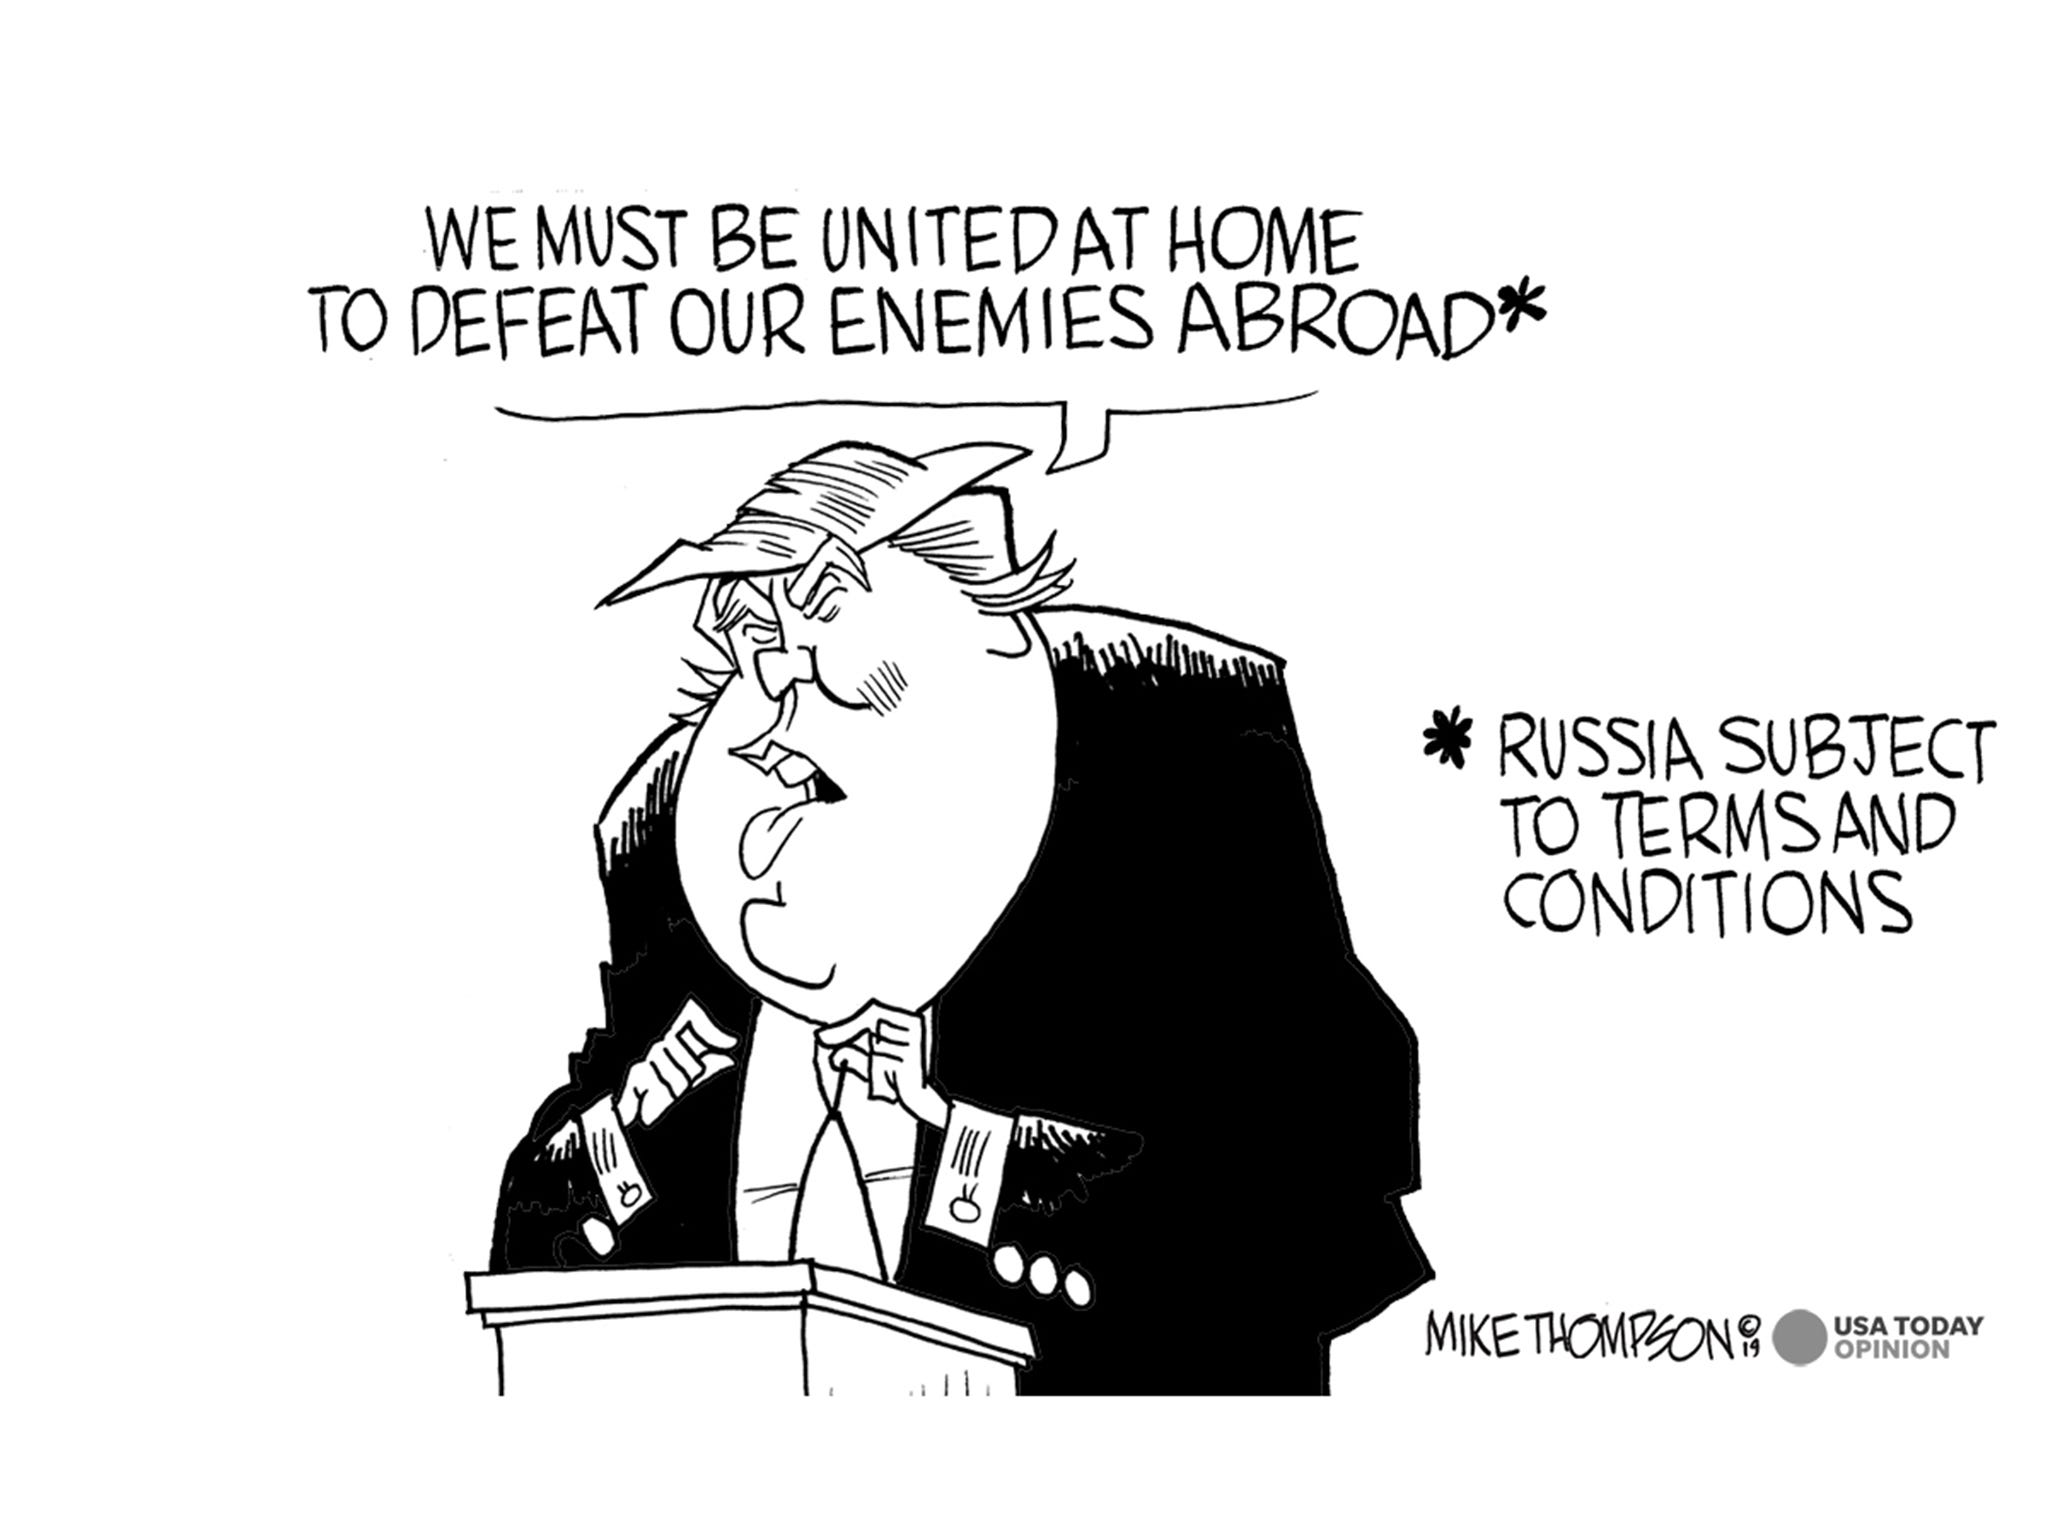 Mike Thompson/Detroit Free Press